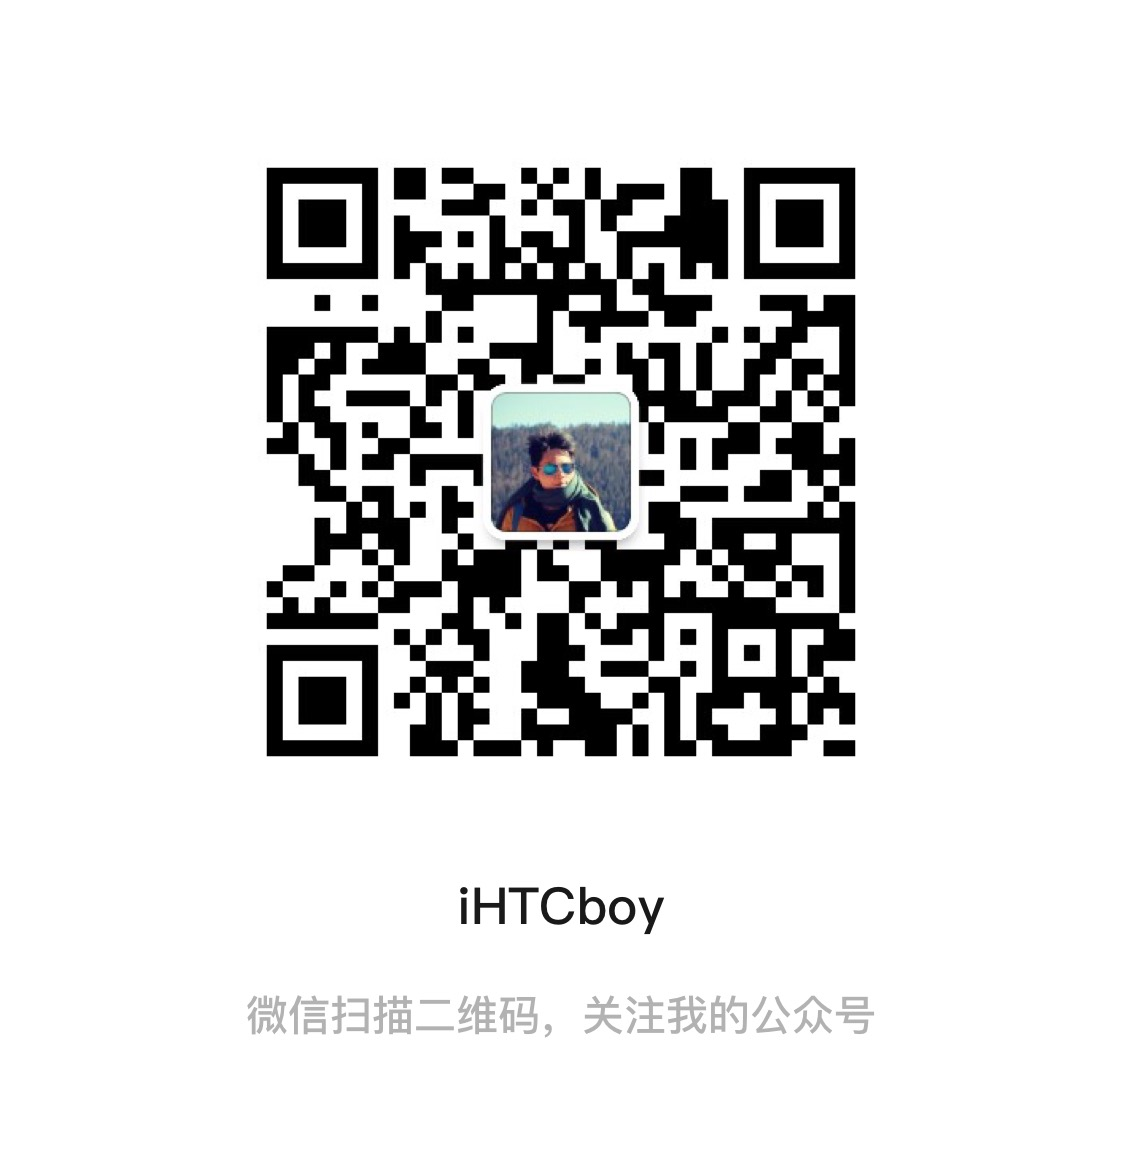 201805_iHTCboy公众号.jpg